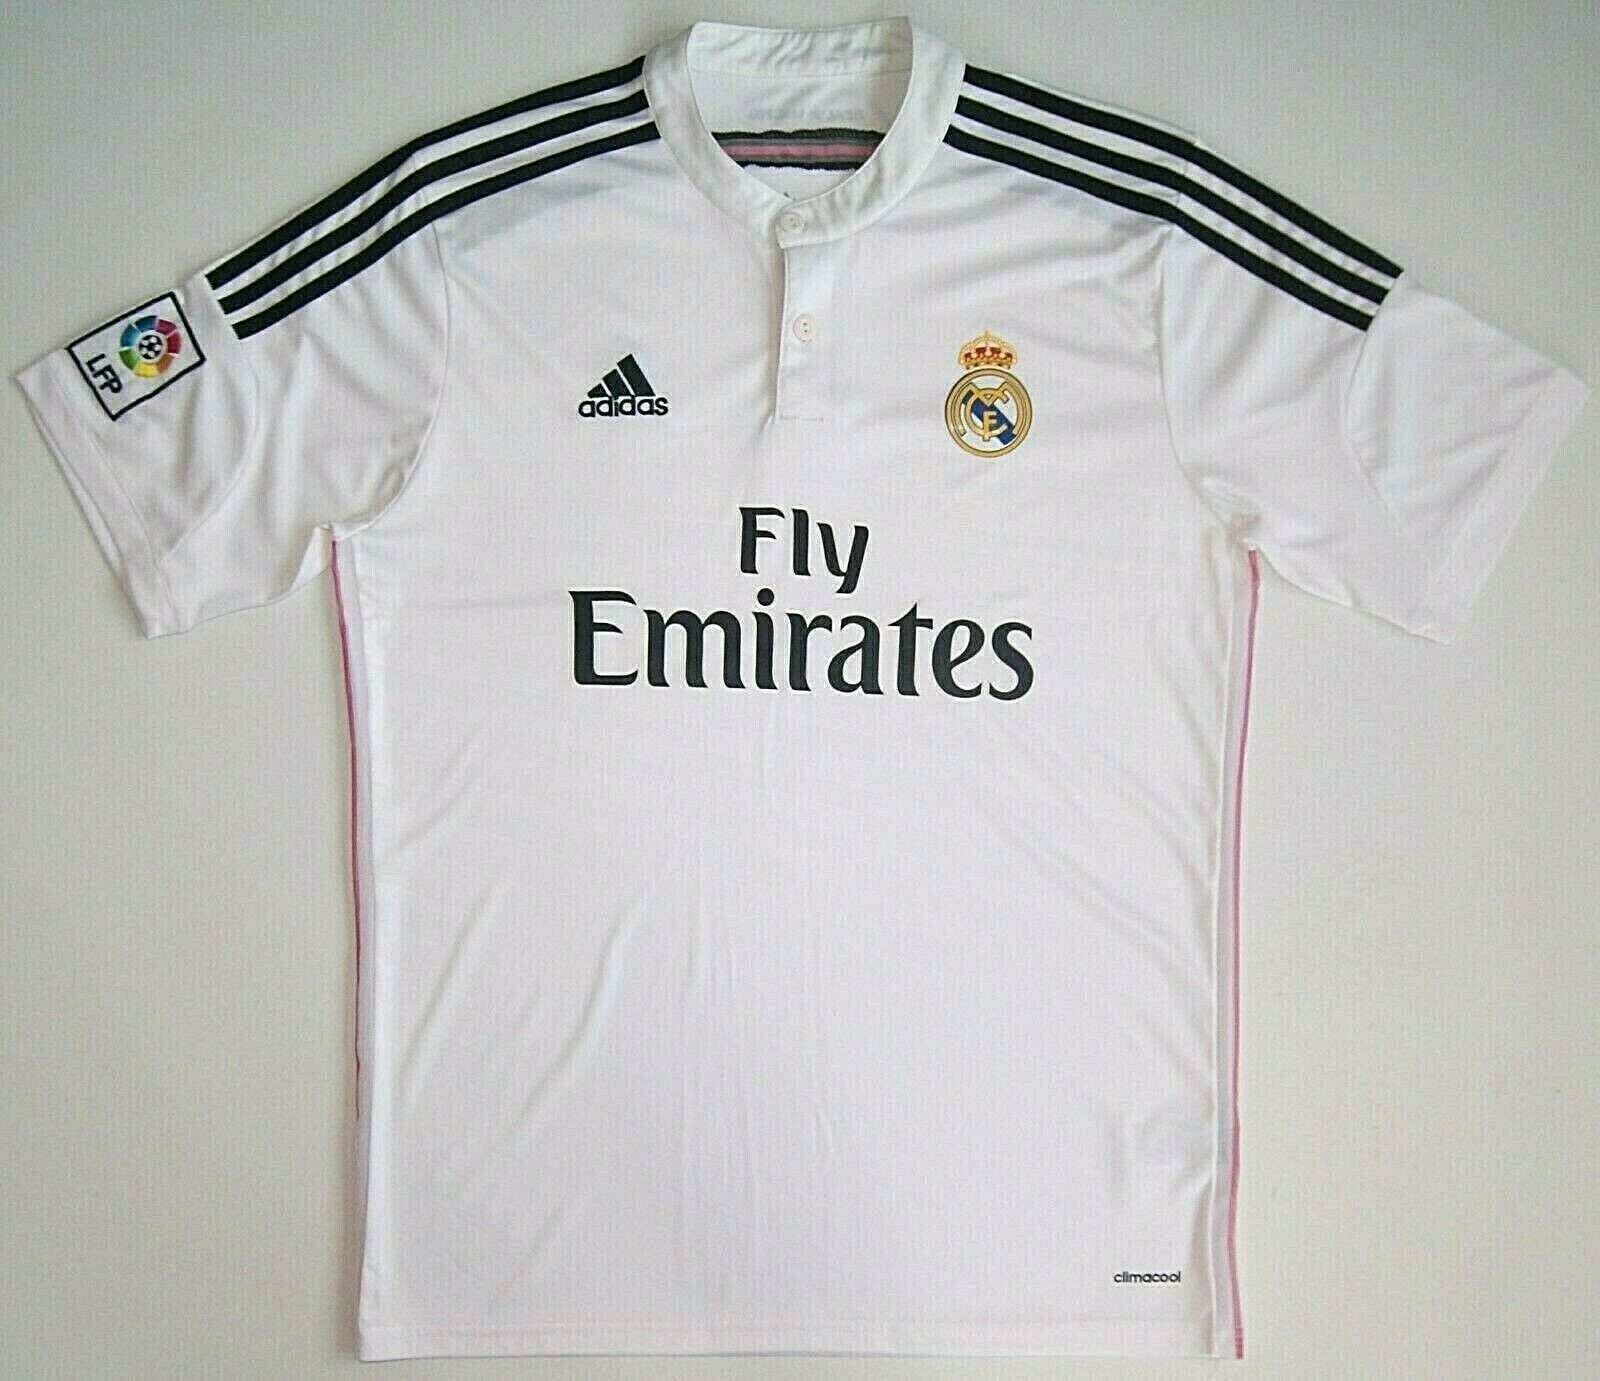 Jersey Real Madrid Adidas Climacool Fly Emirates LFP Footbal T-shirt Soccer Mens